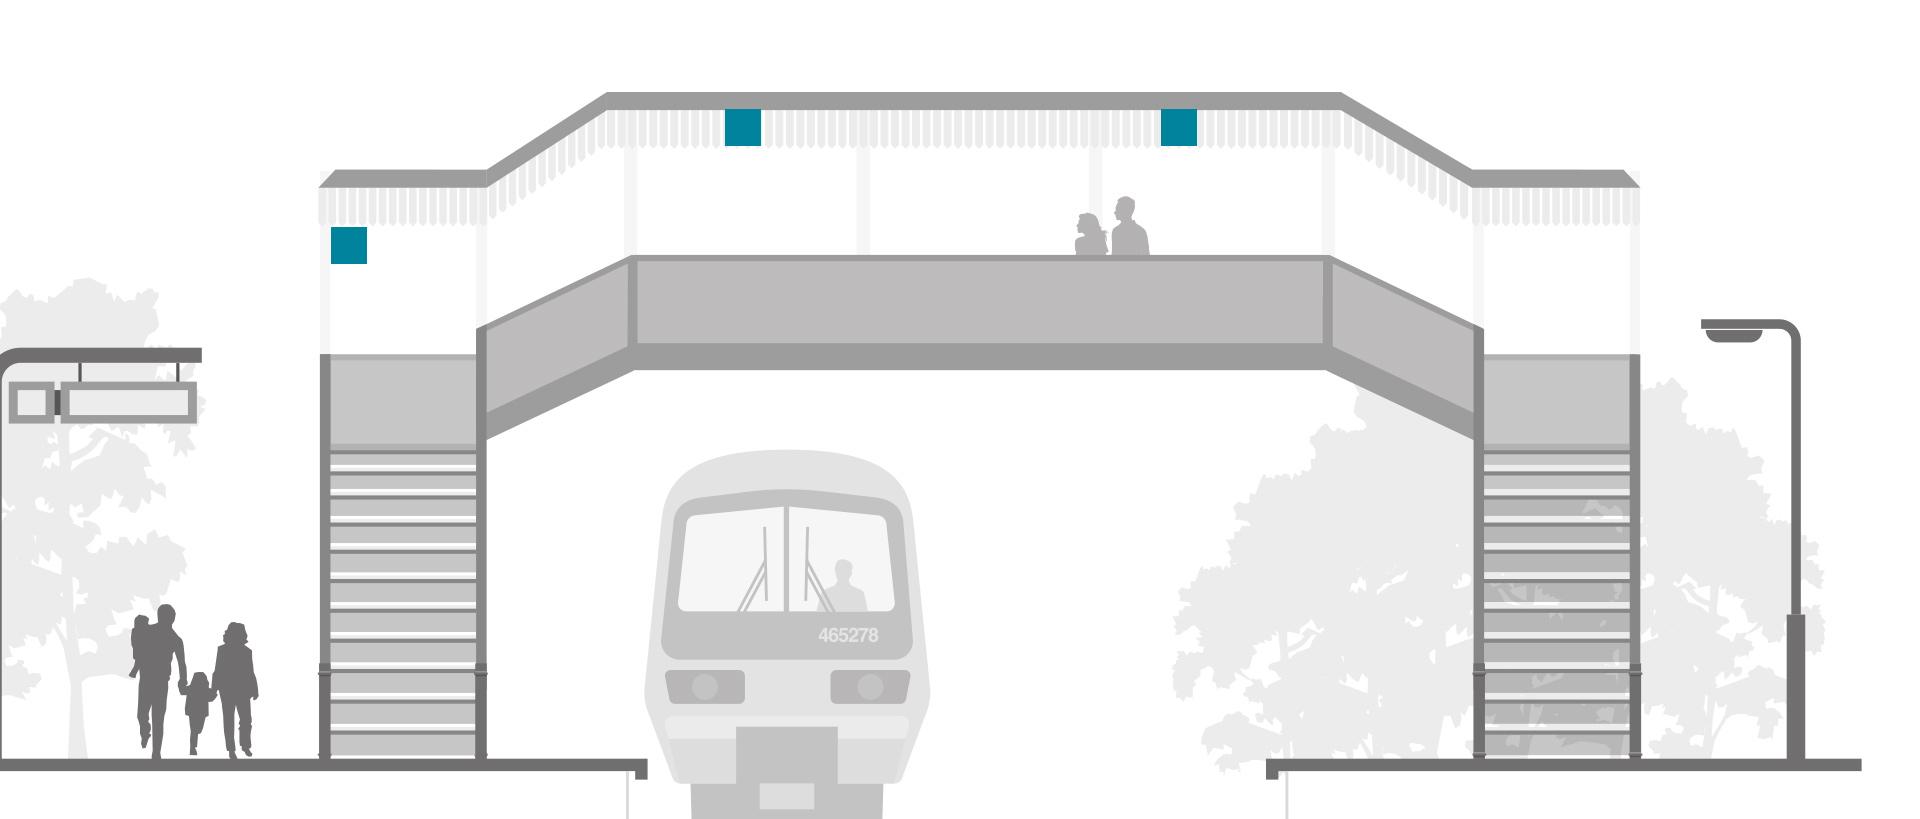 Bahnhofsleuchten Treppen Brücken